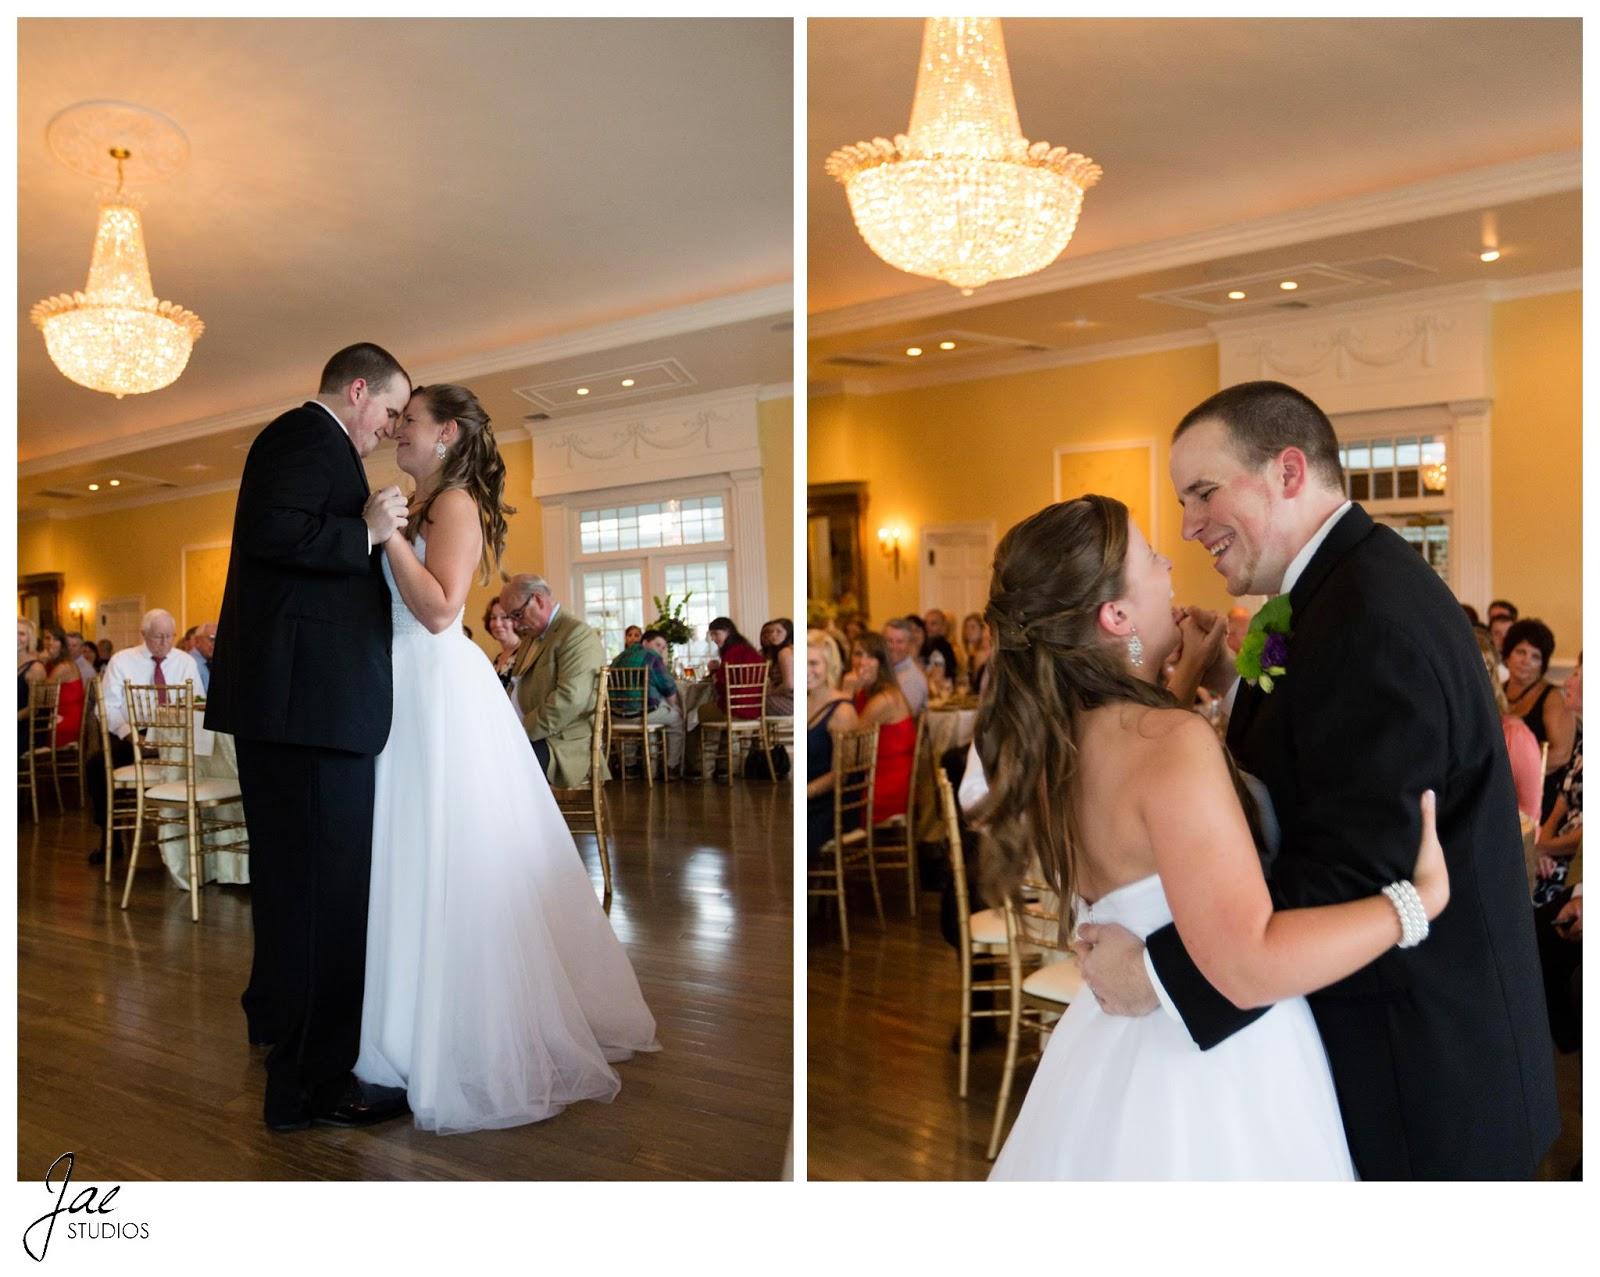 Jonathan and Julie, Bird cage, West Manor Estate, Wedding, Lynchburg, Virginia, Jae Studios, wedding dress, dancing, laughing, chandelier, guests, reception, pearl bracelet, boutonniere, flowers